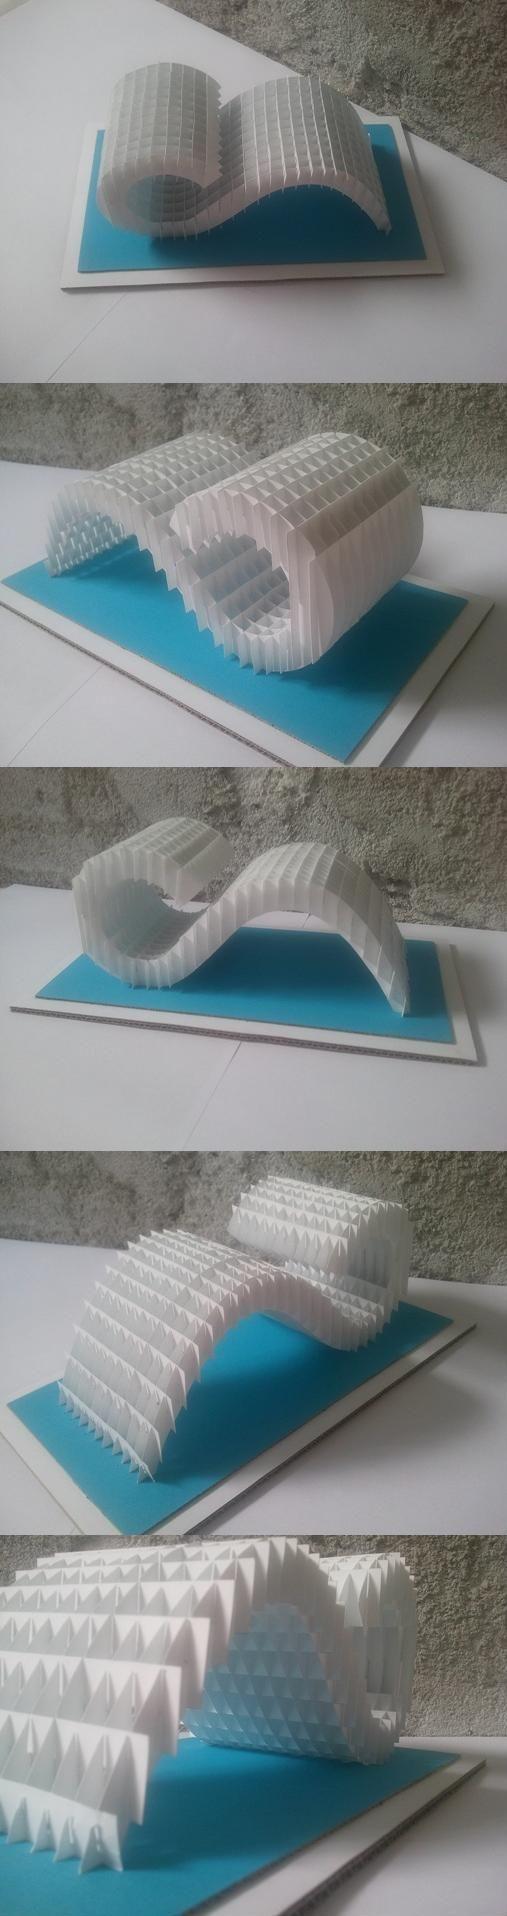 Wave sliceform by MirieSolem.deviantart.com on @deviantART